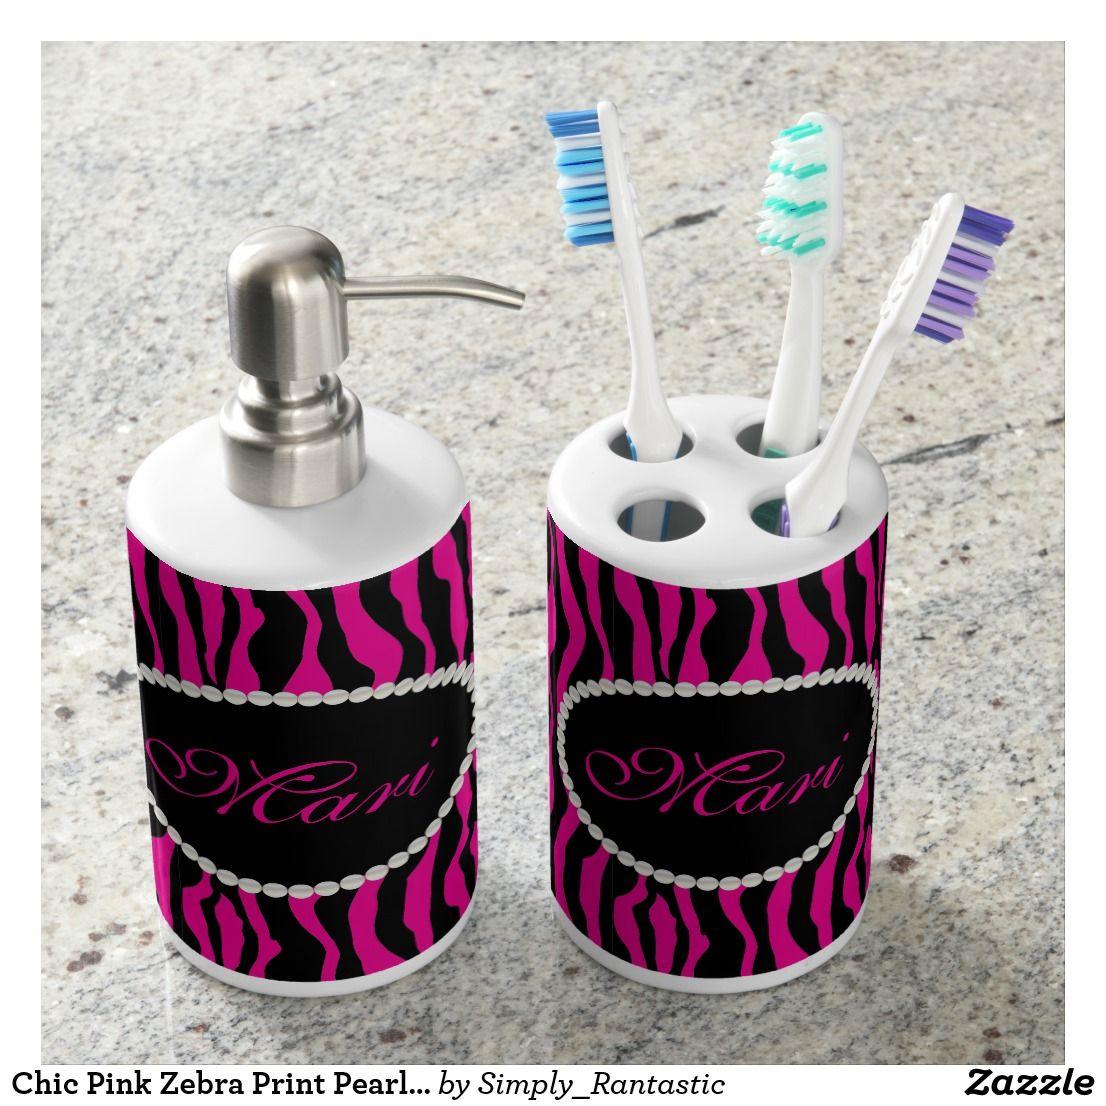 Chic Pink Zebra Print Pearl Monogram Soap Dispenser & Toothbrush ...